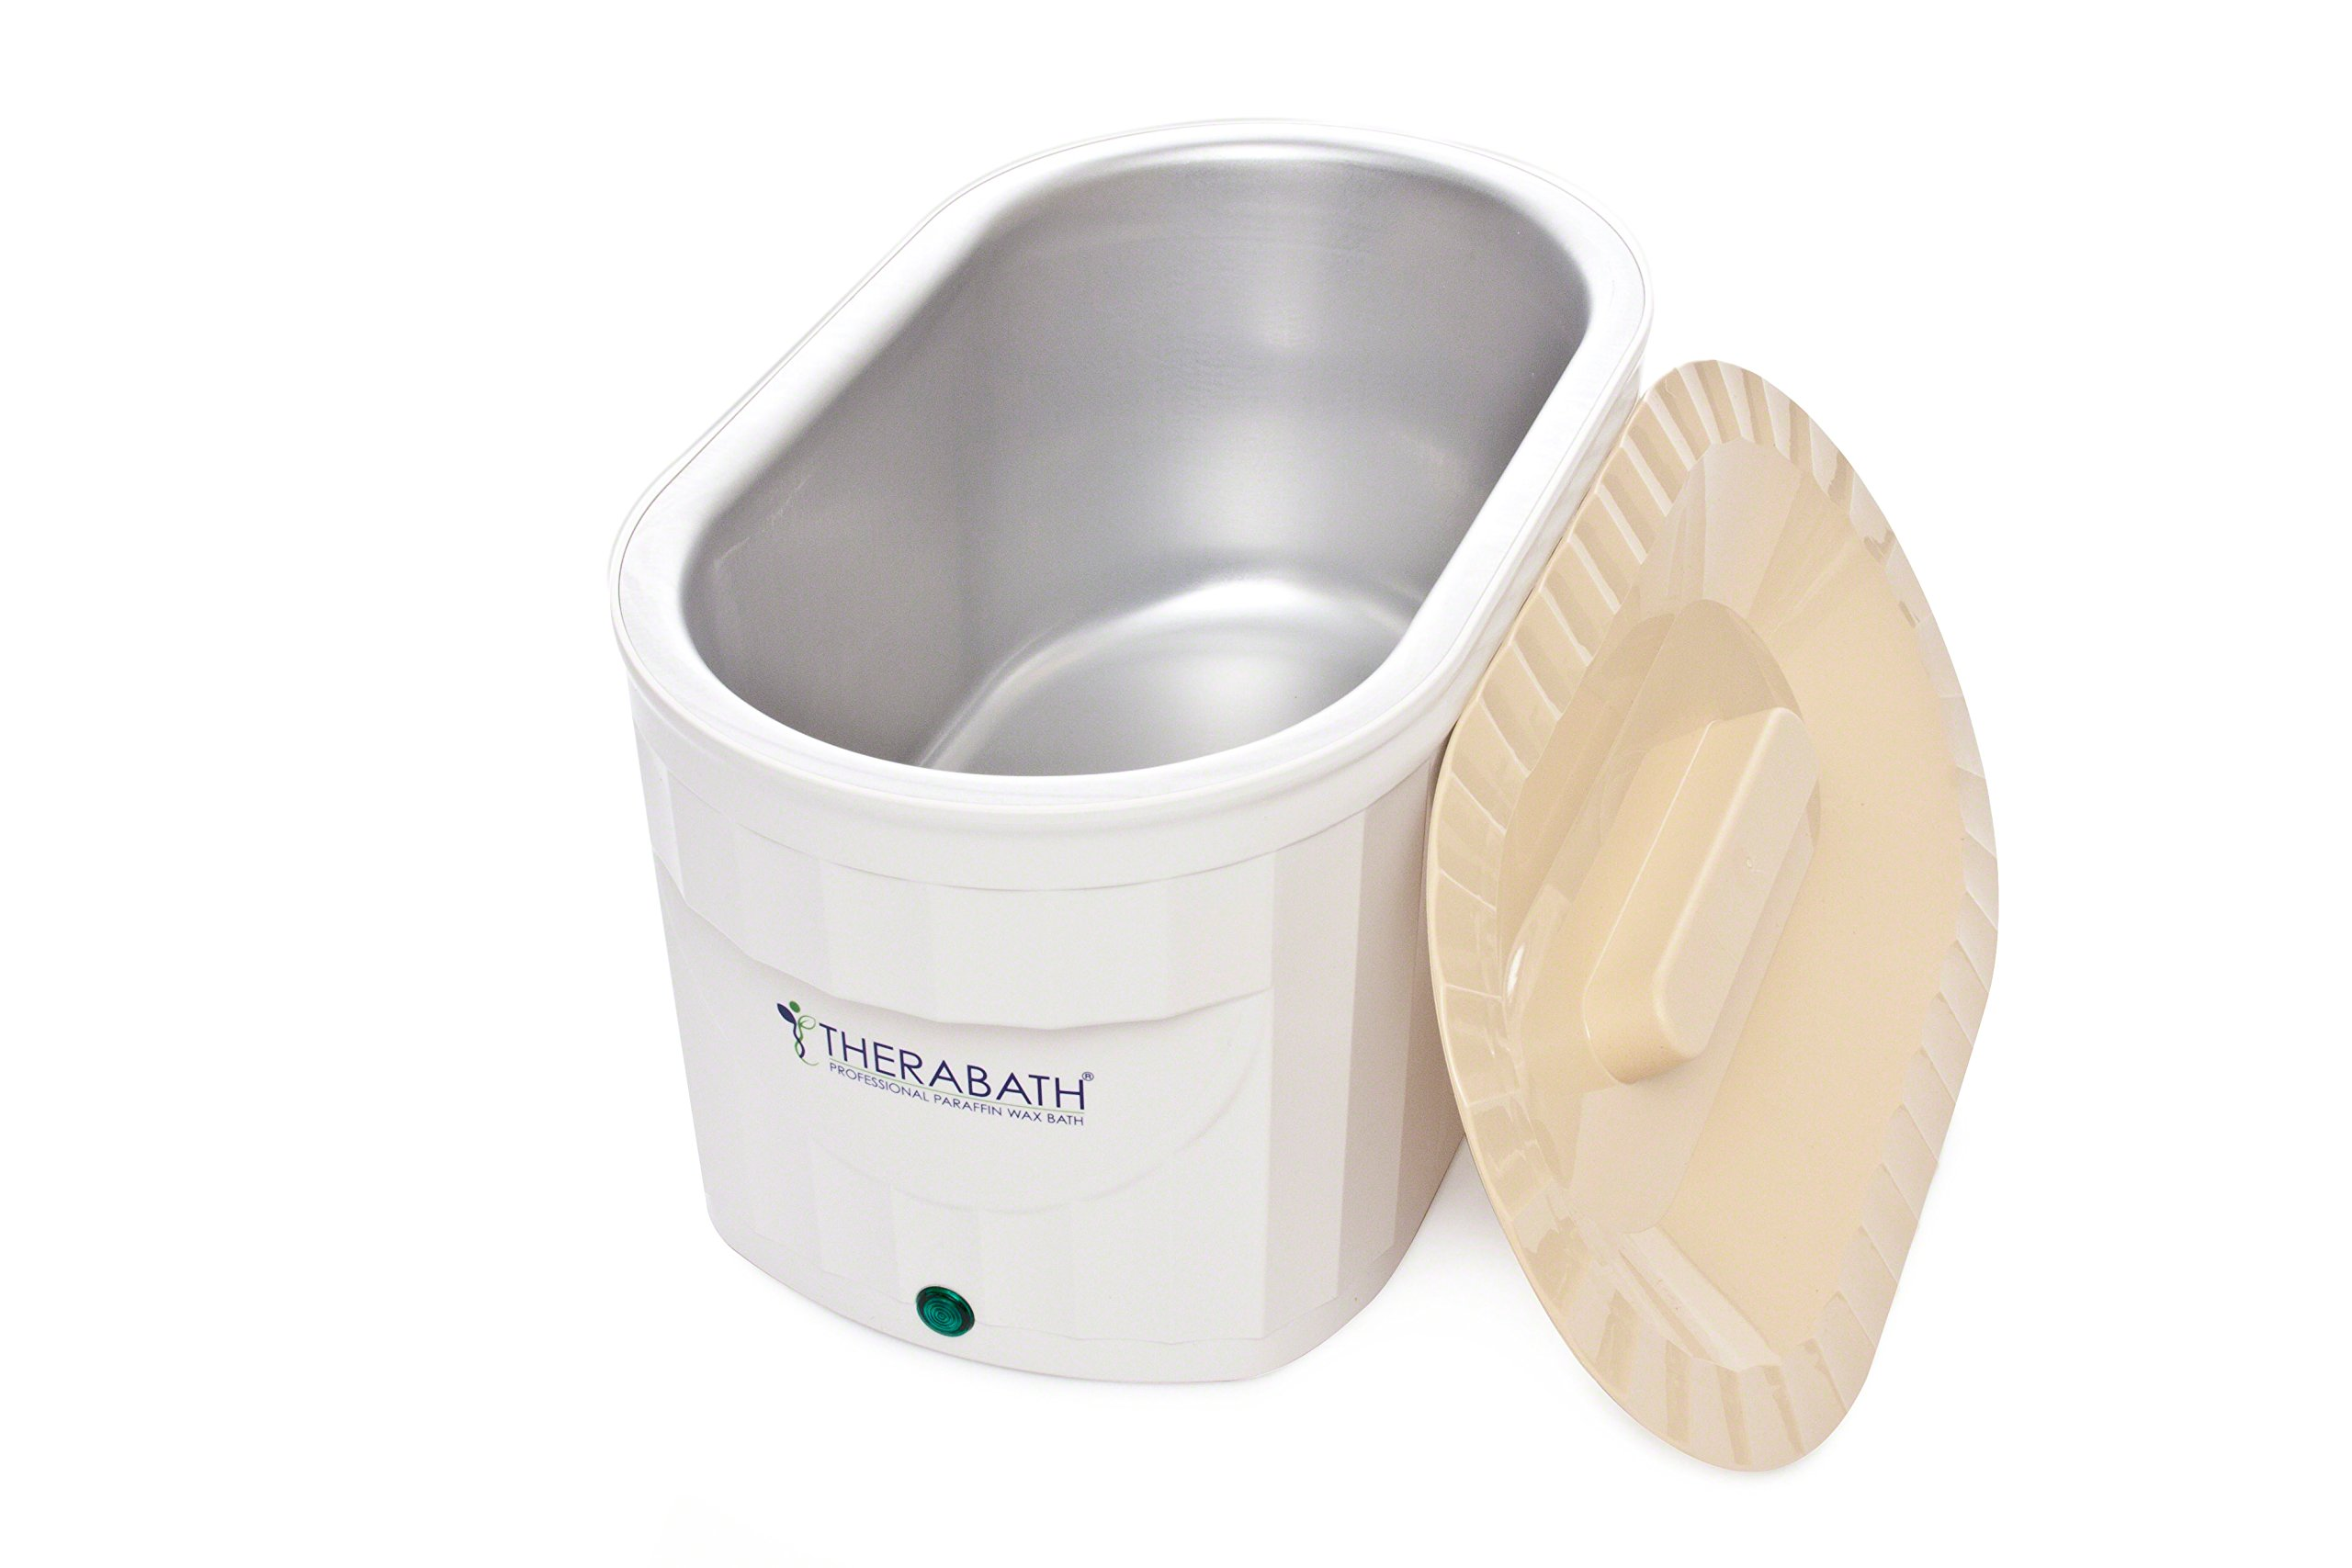 WR Medical Therabath PRO Professional Grade Paraffin Bath - Sku WRM2300 by WR (Image #4)